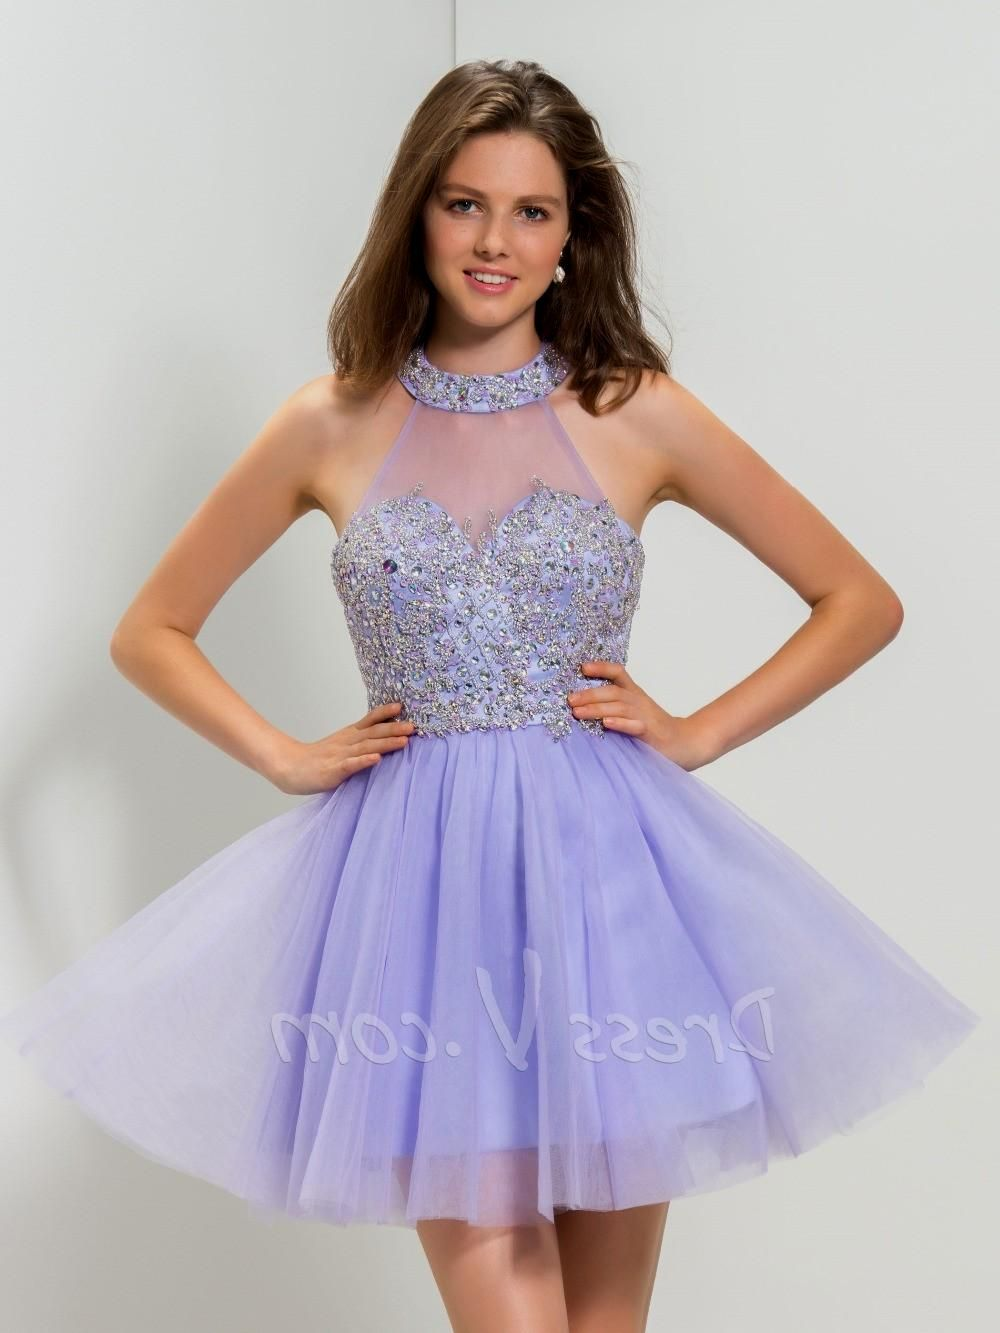 fancy cocktail dress - Dress Yp | Adorable Wallpapers | Pinterest